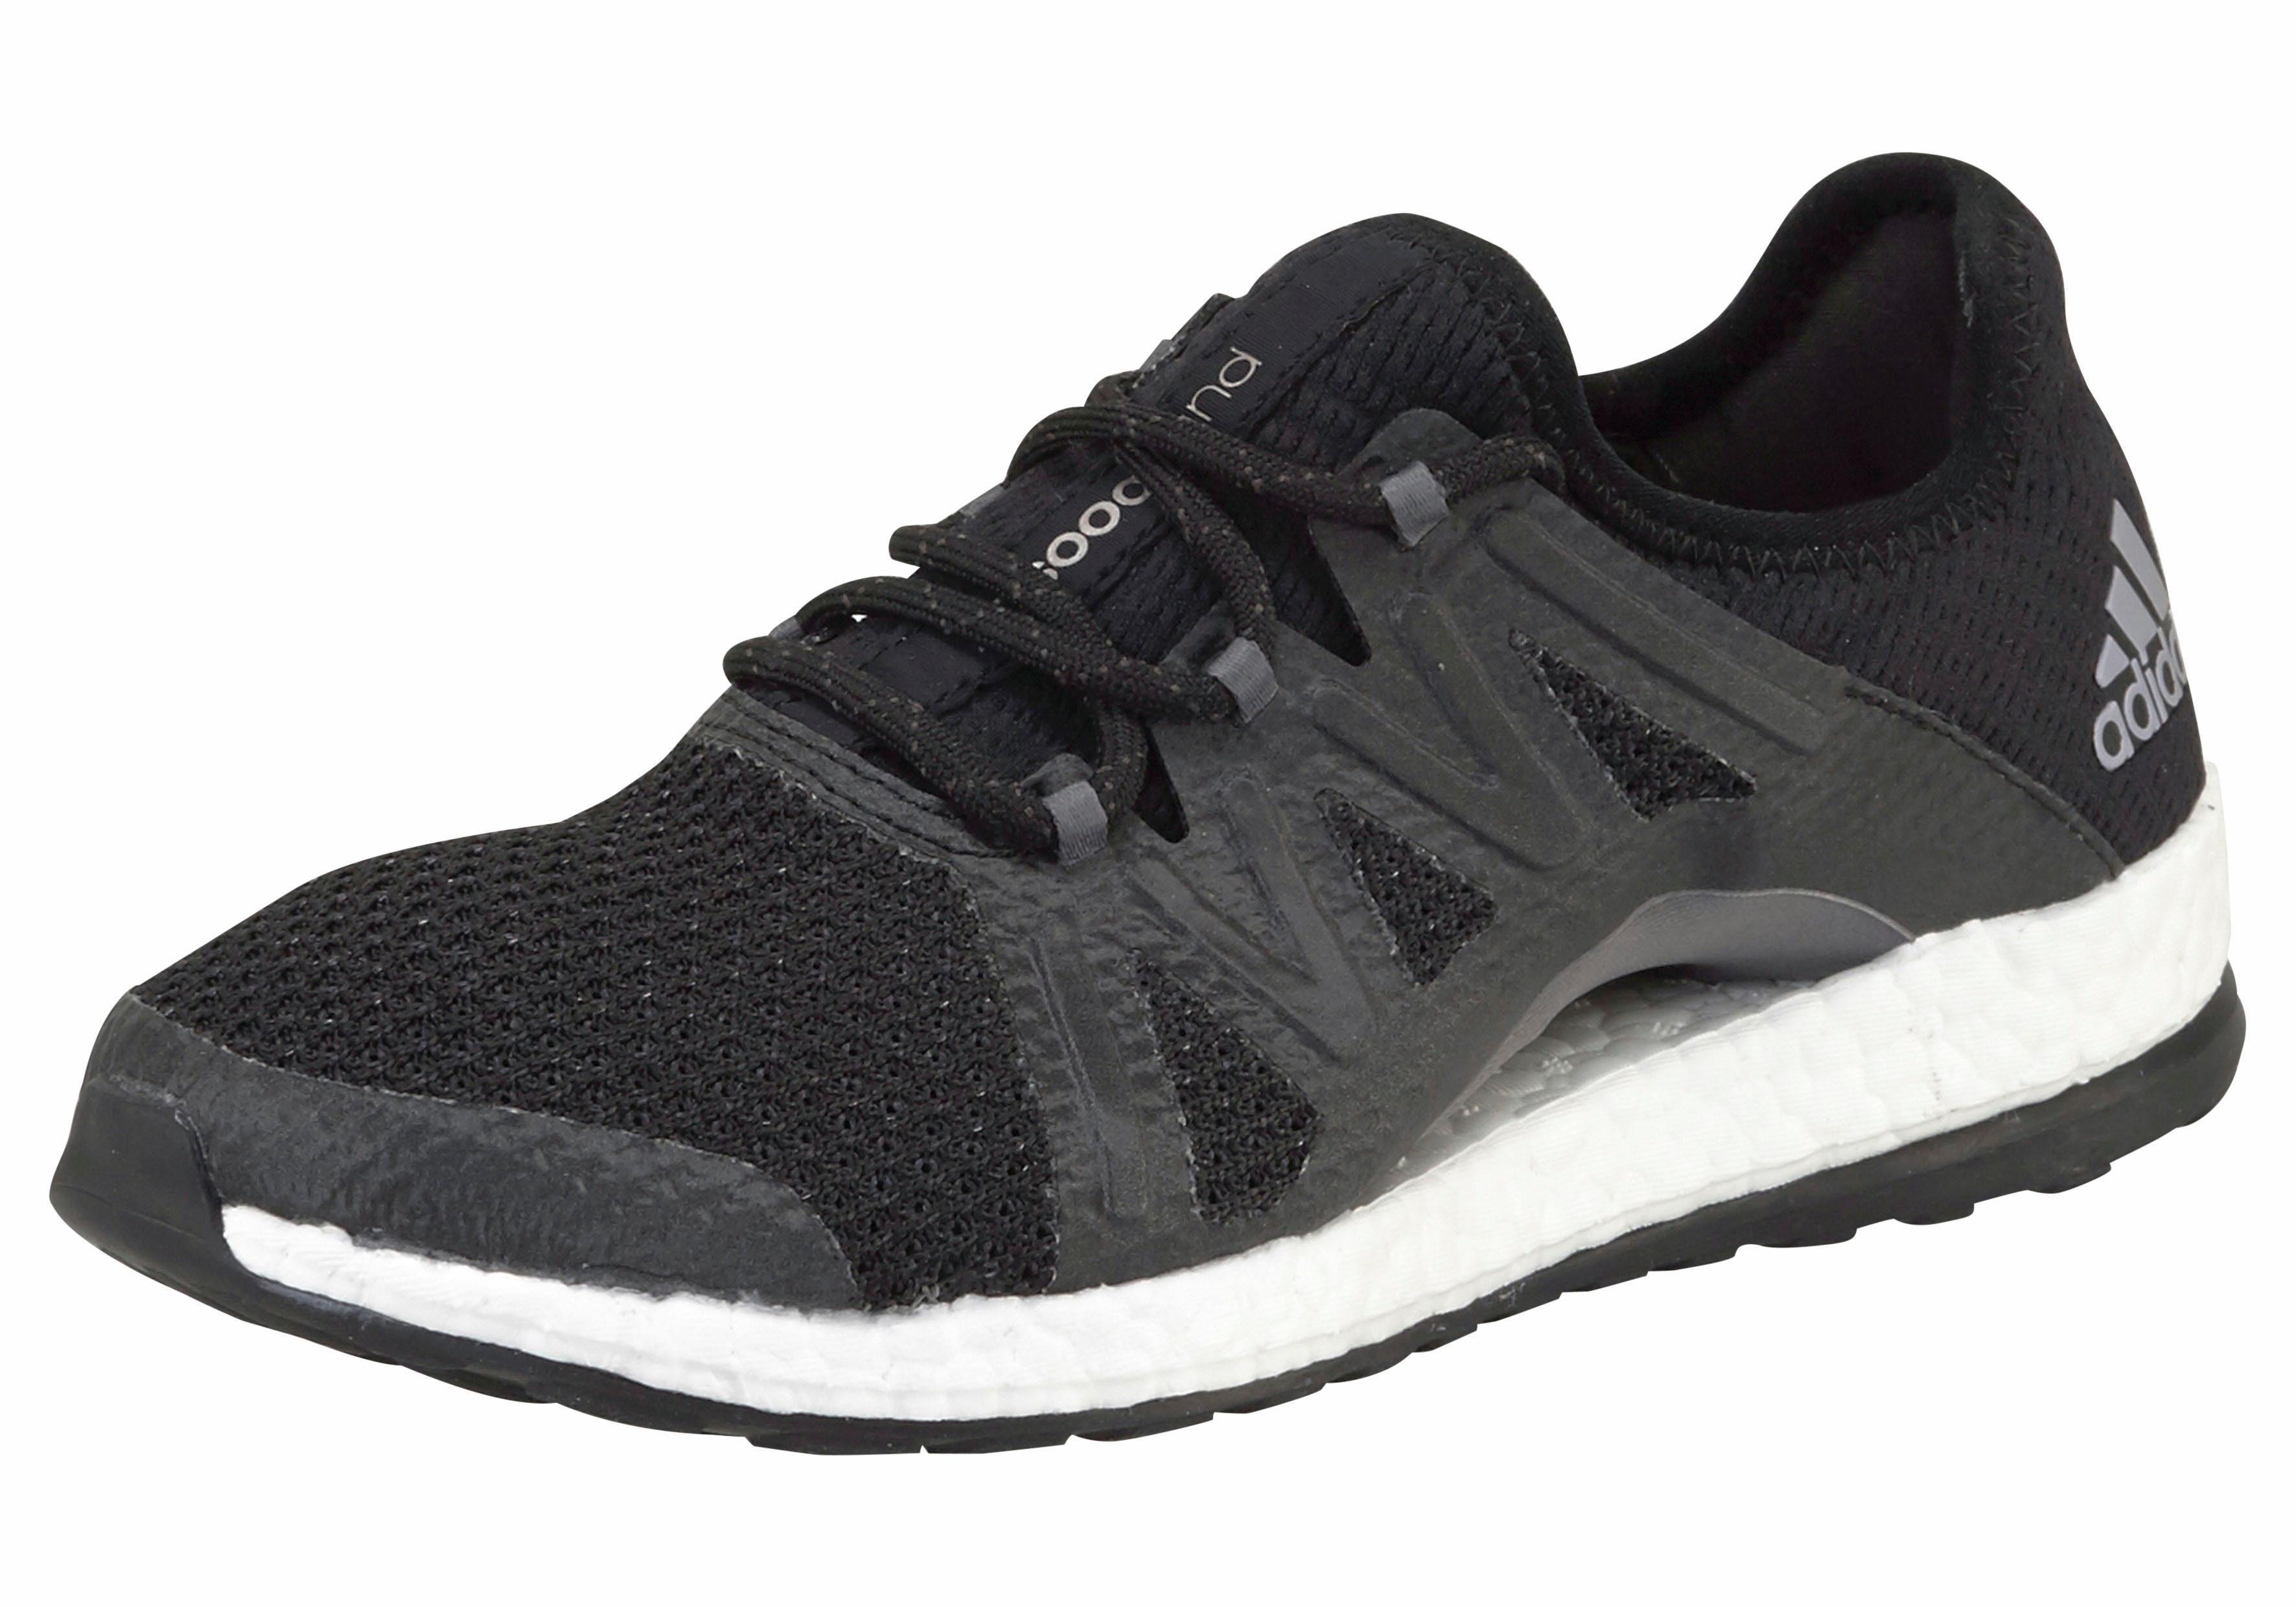 adidas Performance Pure Boost Xpose Laufschuh  schwarz